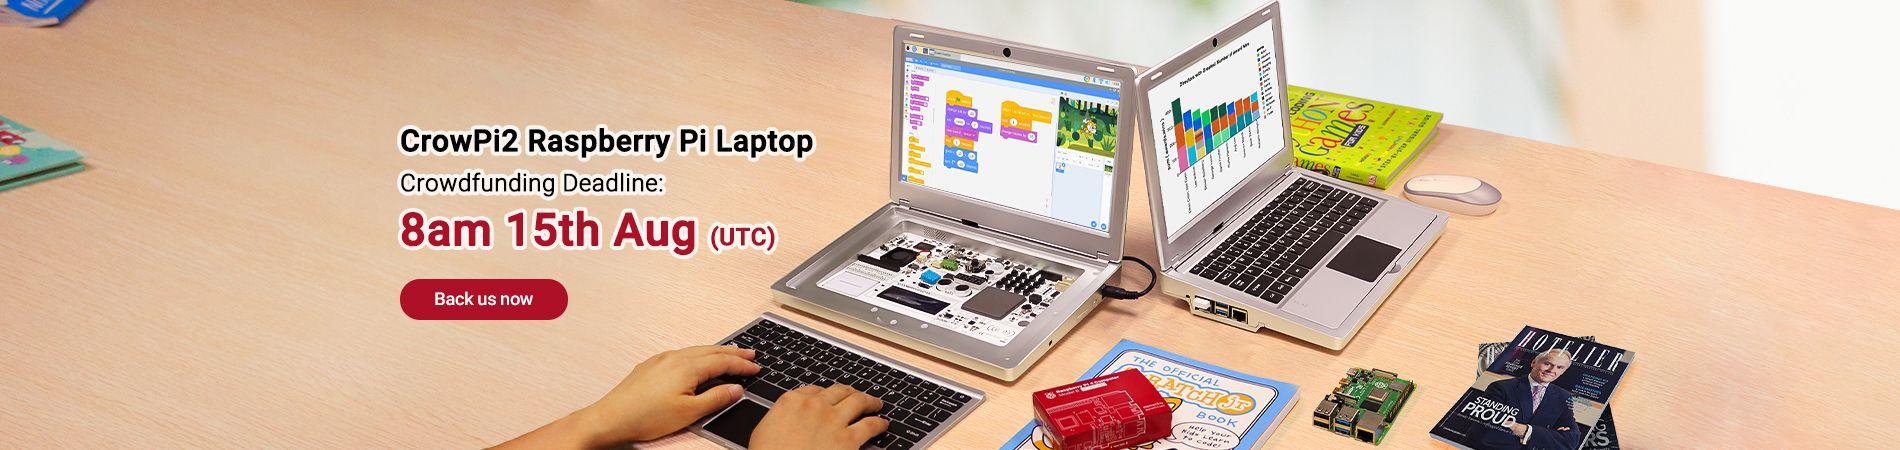 https://www.kickstarter.com/projects/elecrow/crowpi2-steam-education-platformand-raspberry-pi-laptop